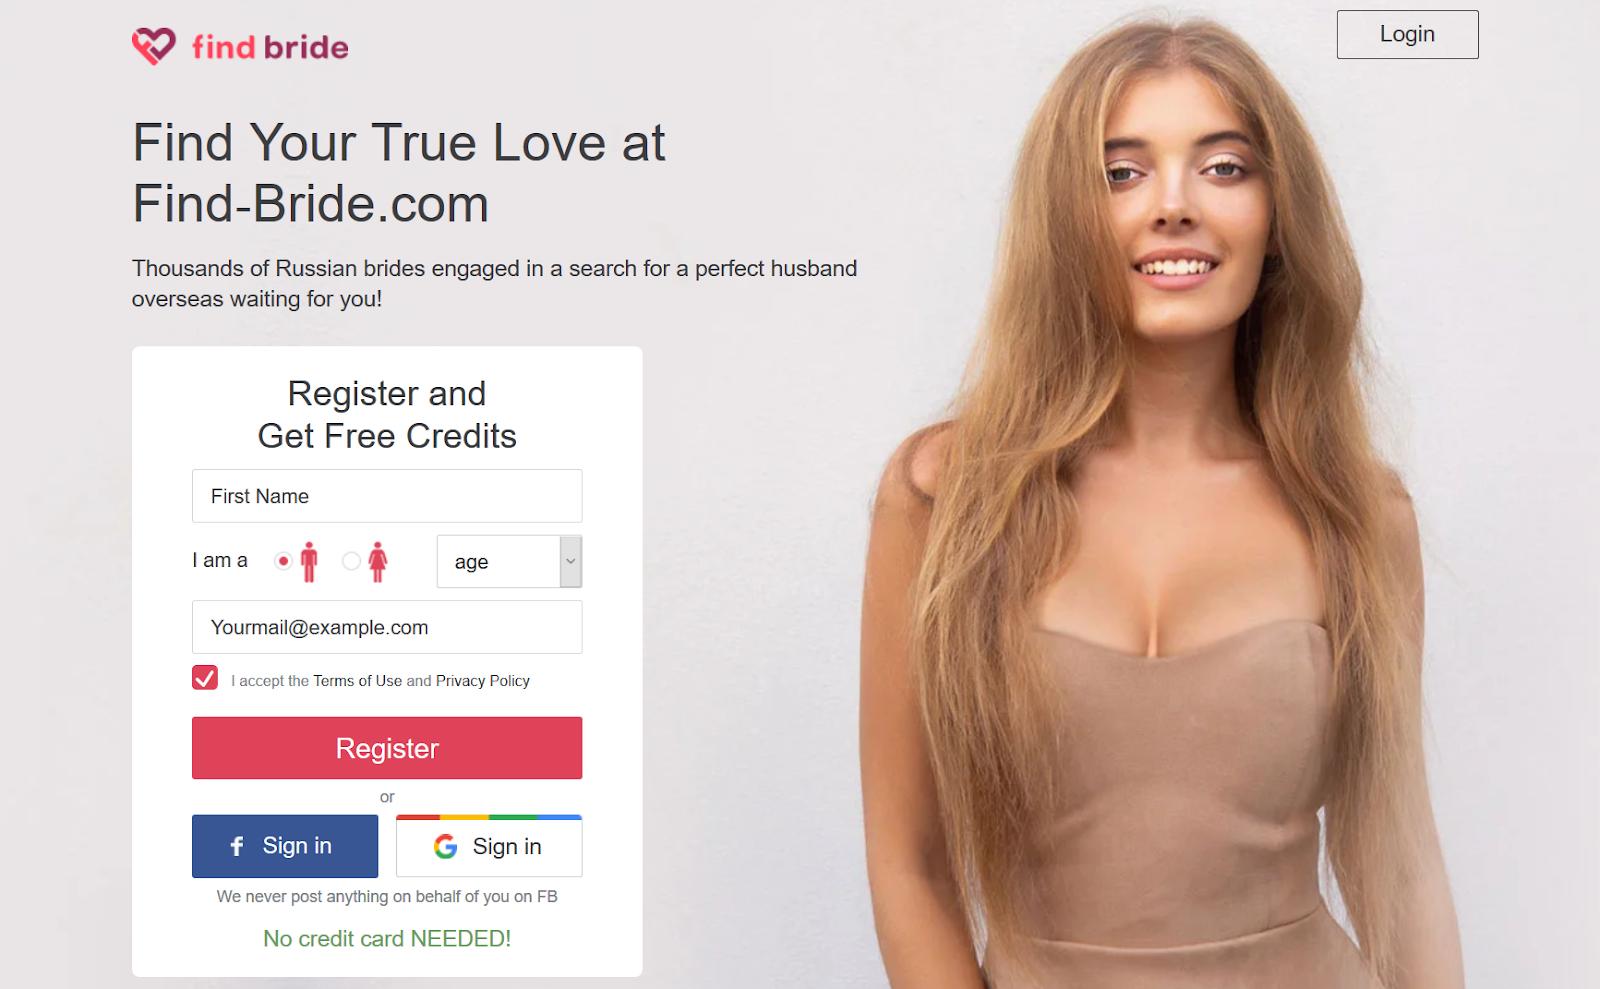 find bride review